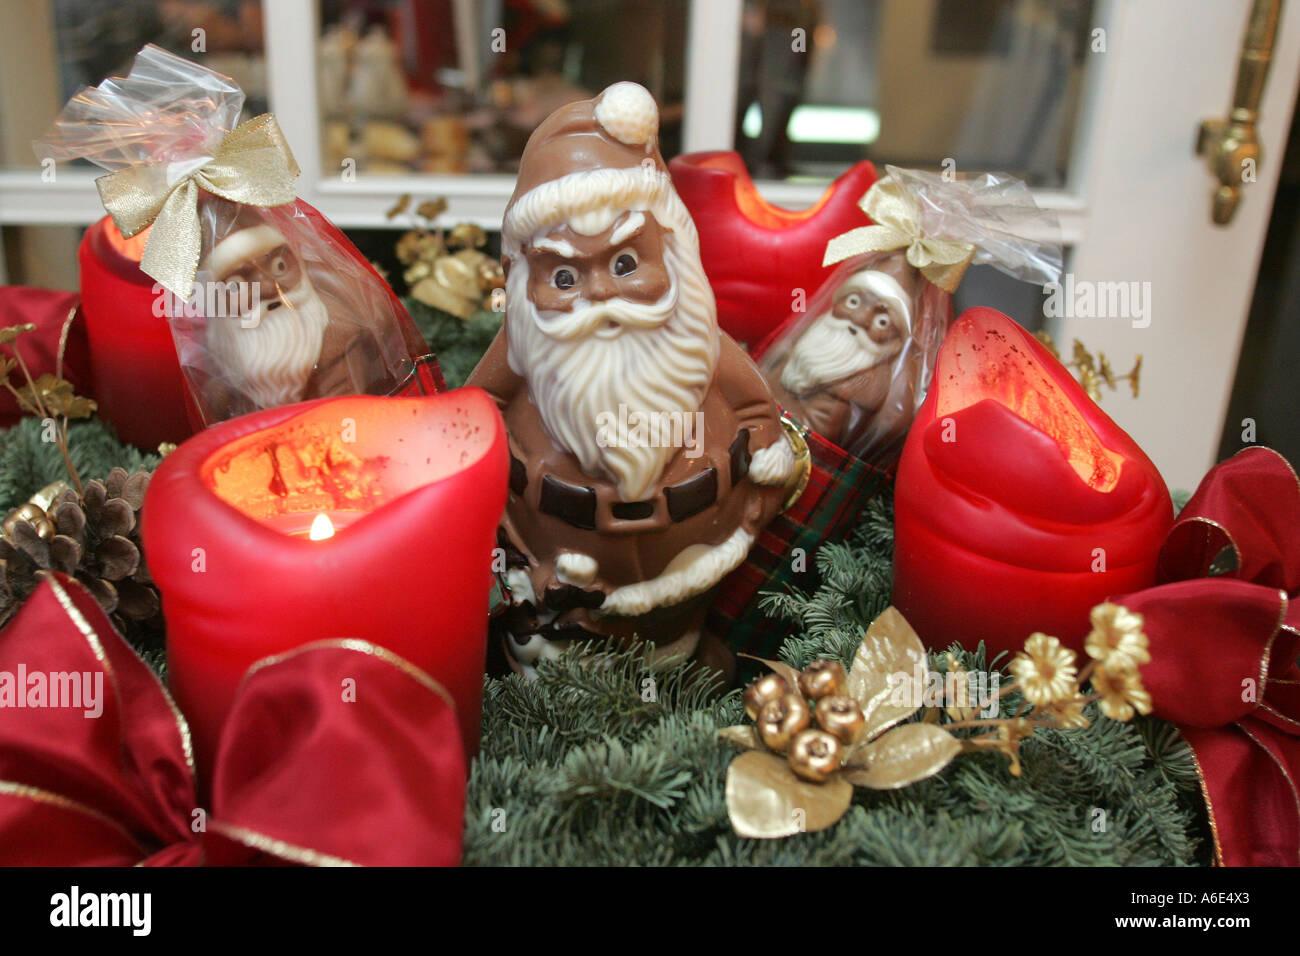 DEU Federal Republic Of Germany Mannheim Chocolate Santa Claus In A Advent Wreath